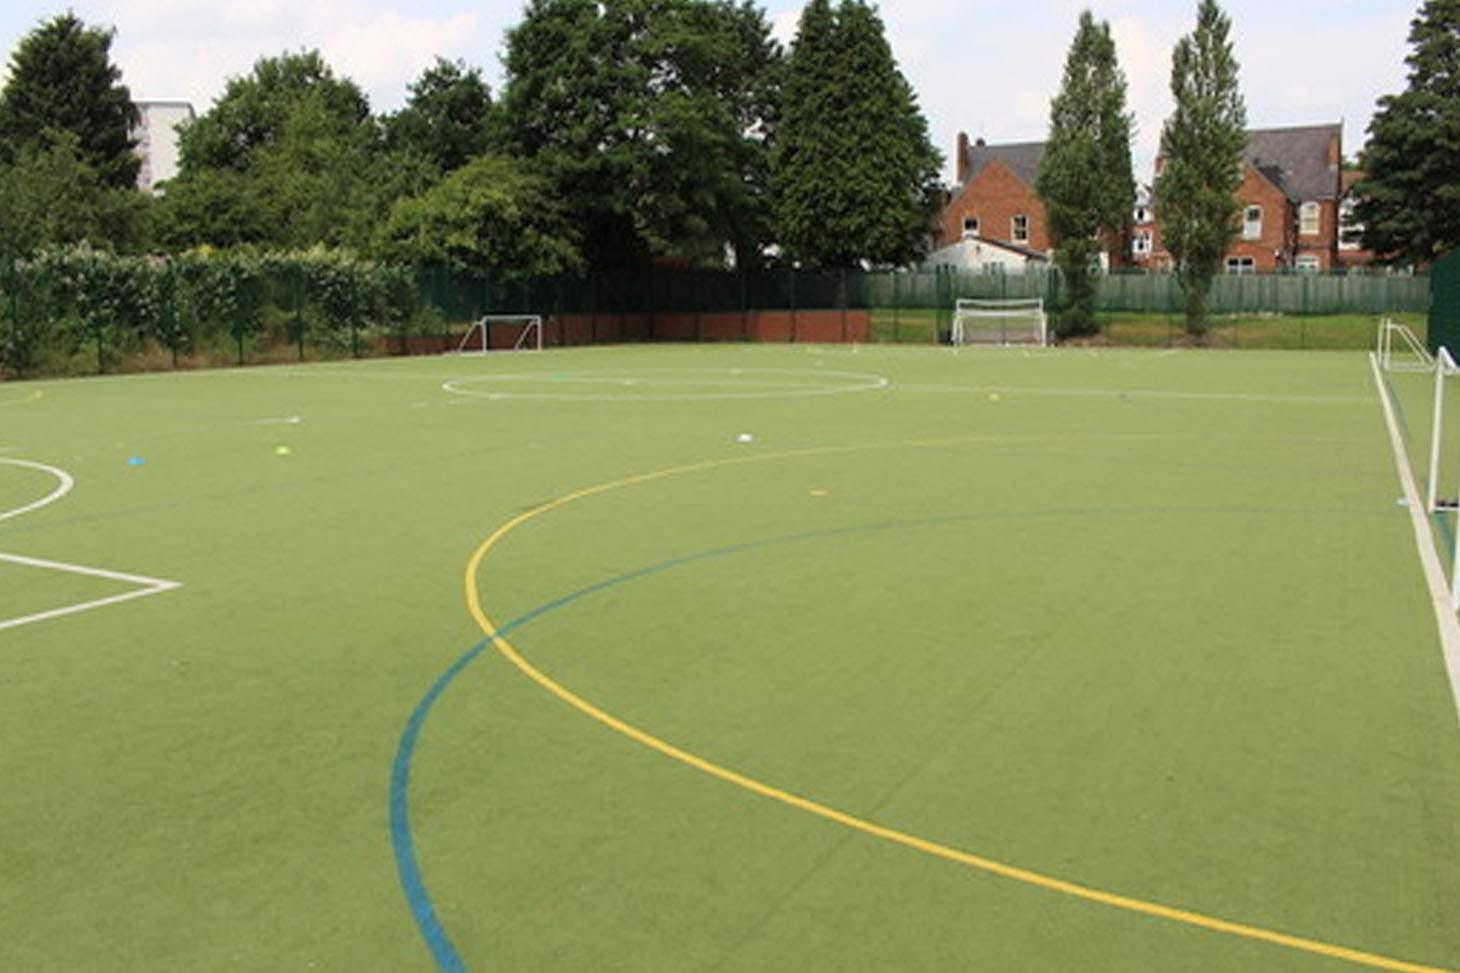 St Edmund Campion Catholic School & Sixth Form Centre Outdoor | Astroturf hockey pitch